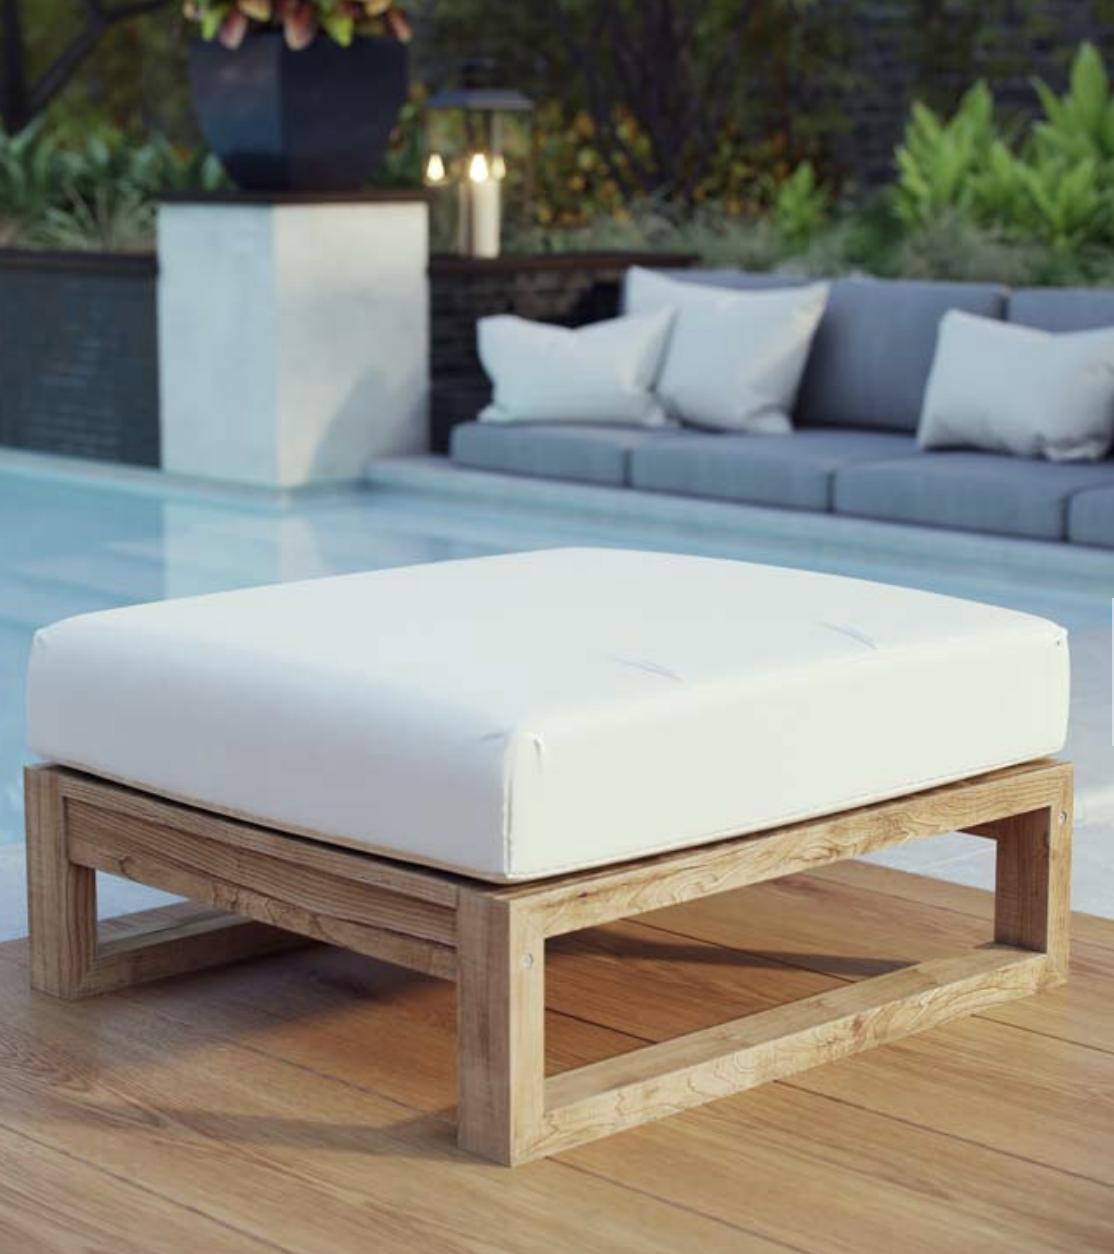 OUTDOOR PATIO TEAK OTTOMAN IN NATURAL WHITE - Teak Ottoman Outdoor Patio Ottoman Outdoor Patio Furniture